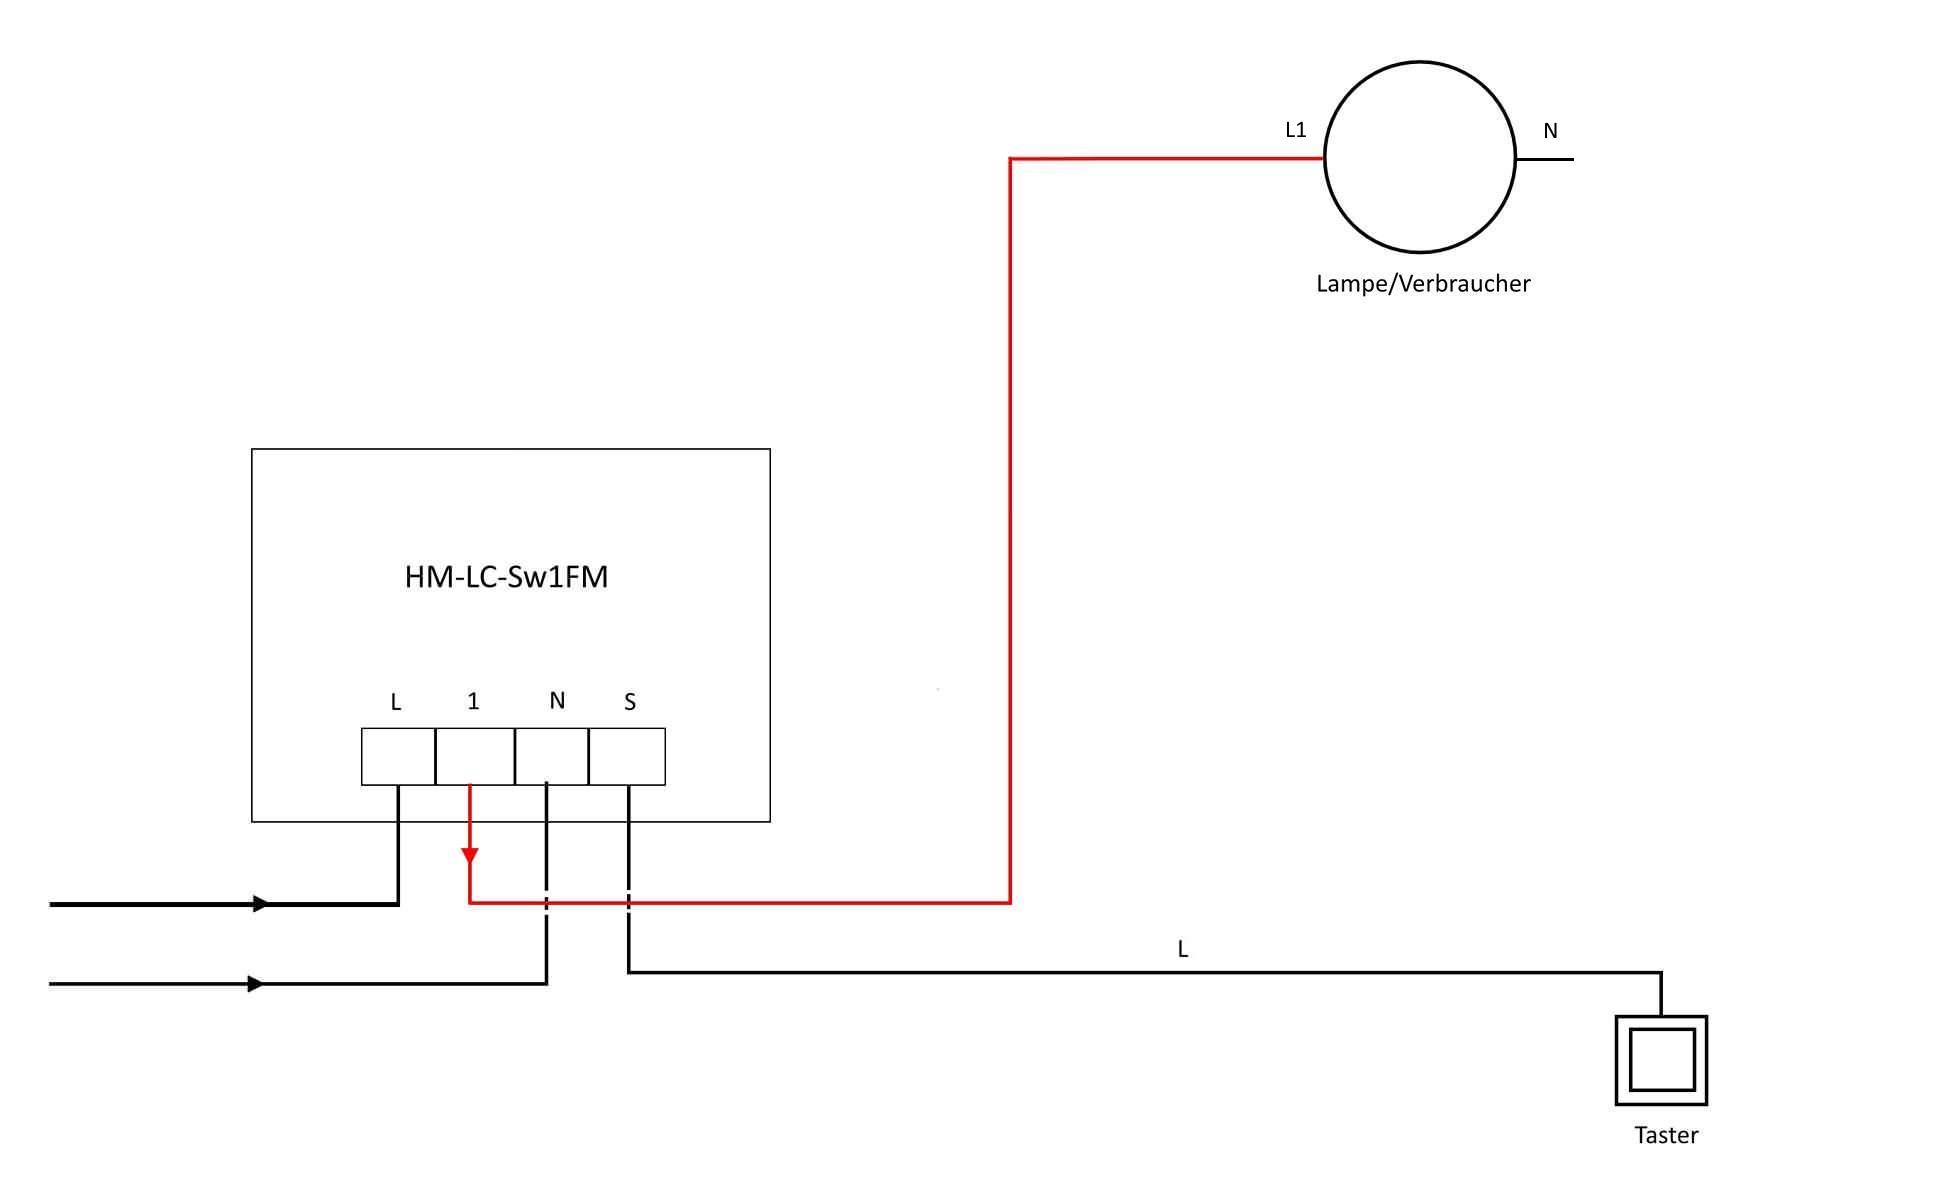 gro z gig wechselschalter verkabelung ideen schaltplan serie circuit collection. Black Bedroom Furniture Sets. Home Design Ideas